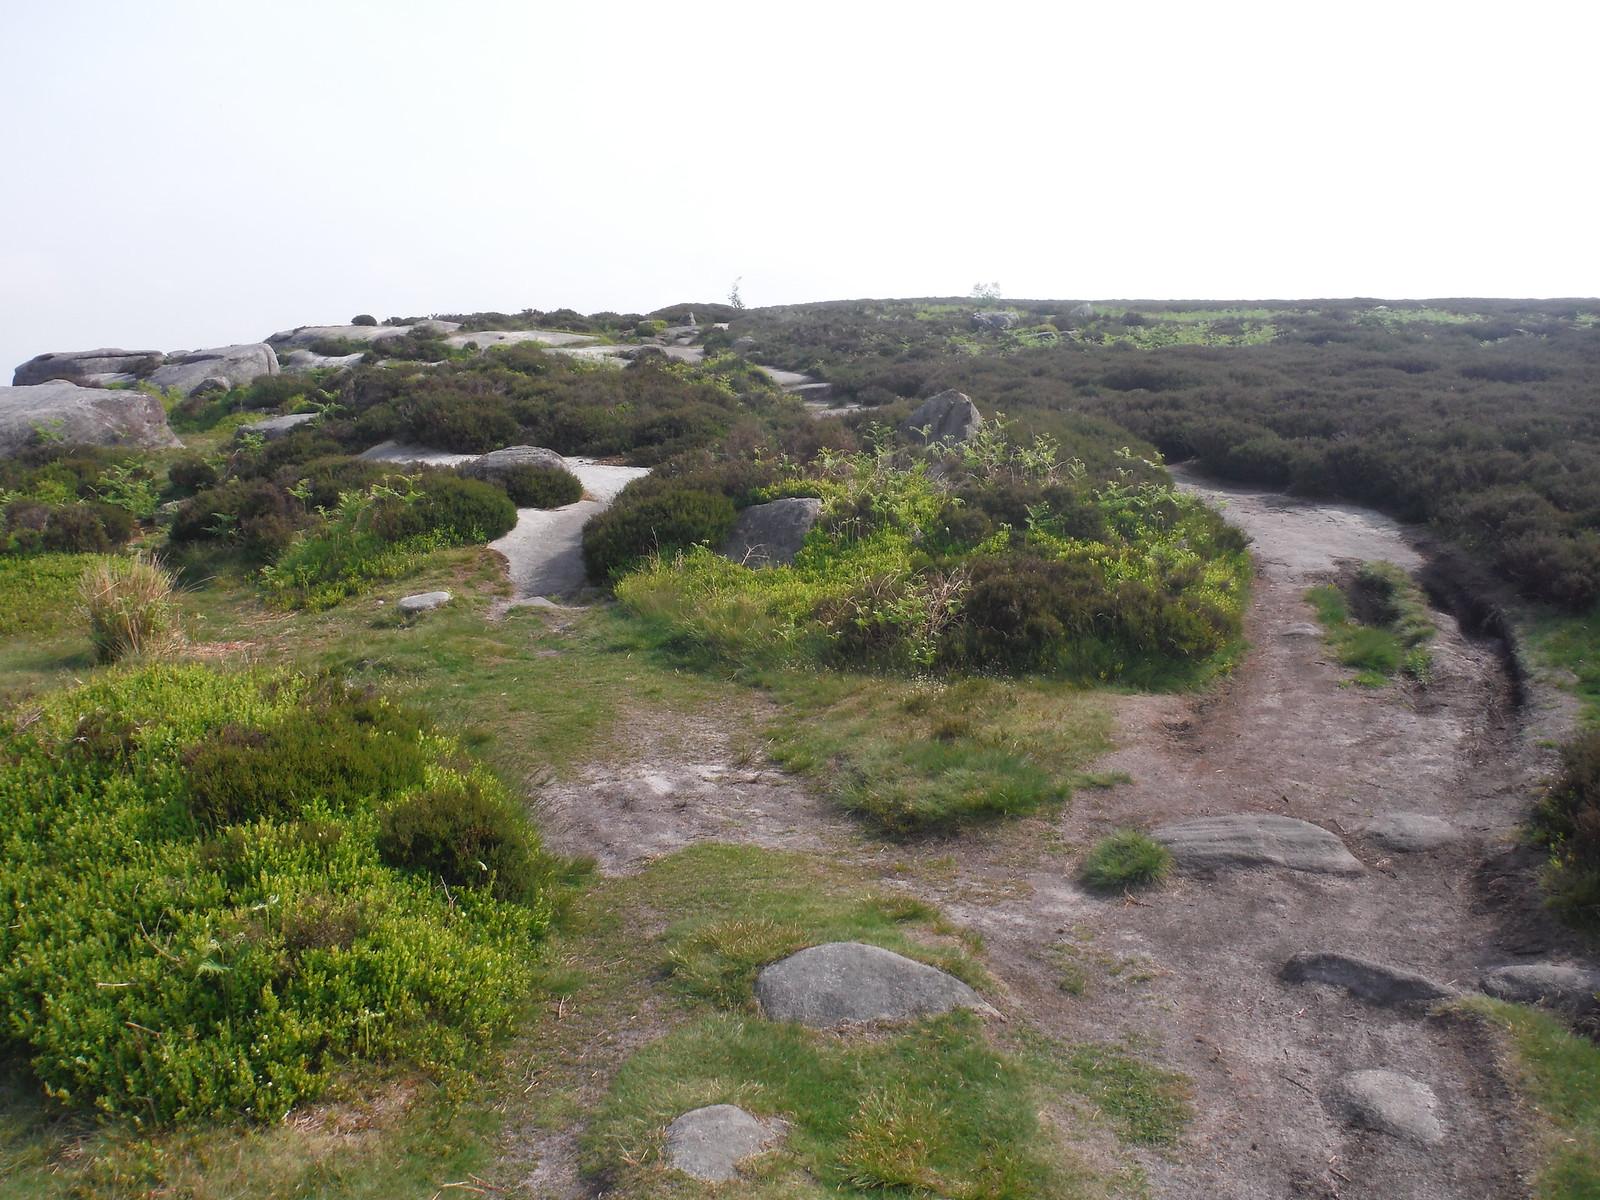 Path along Burbage Rocks SWC Walk 266 - Sheffield to Bamford (via Burbage Rocks and Stanage Edge) or to Moscar Lodge